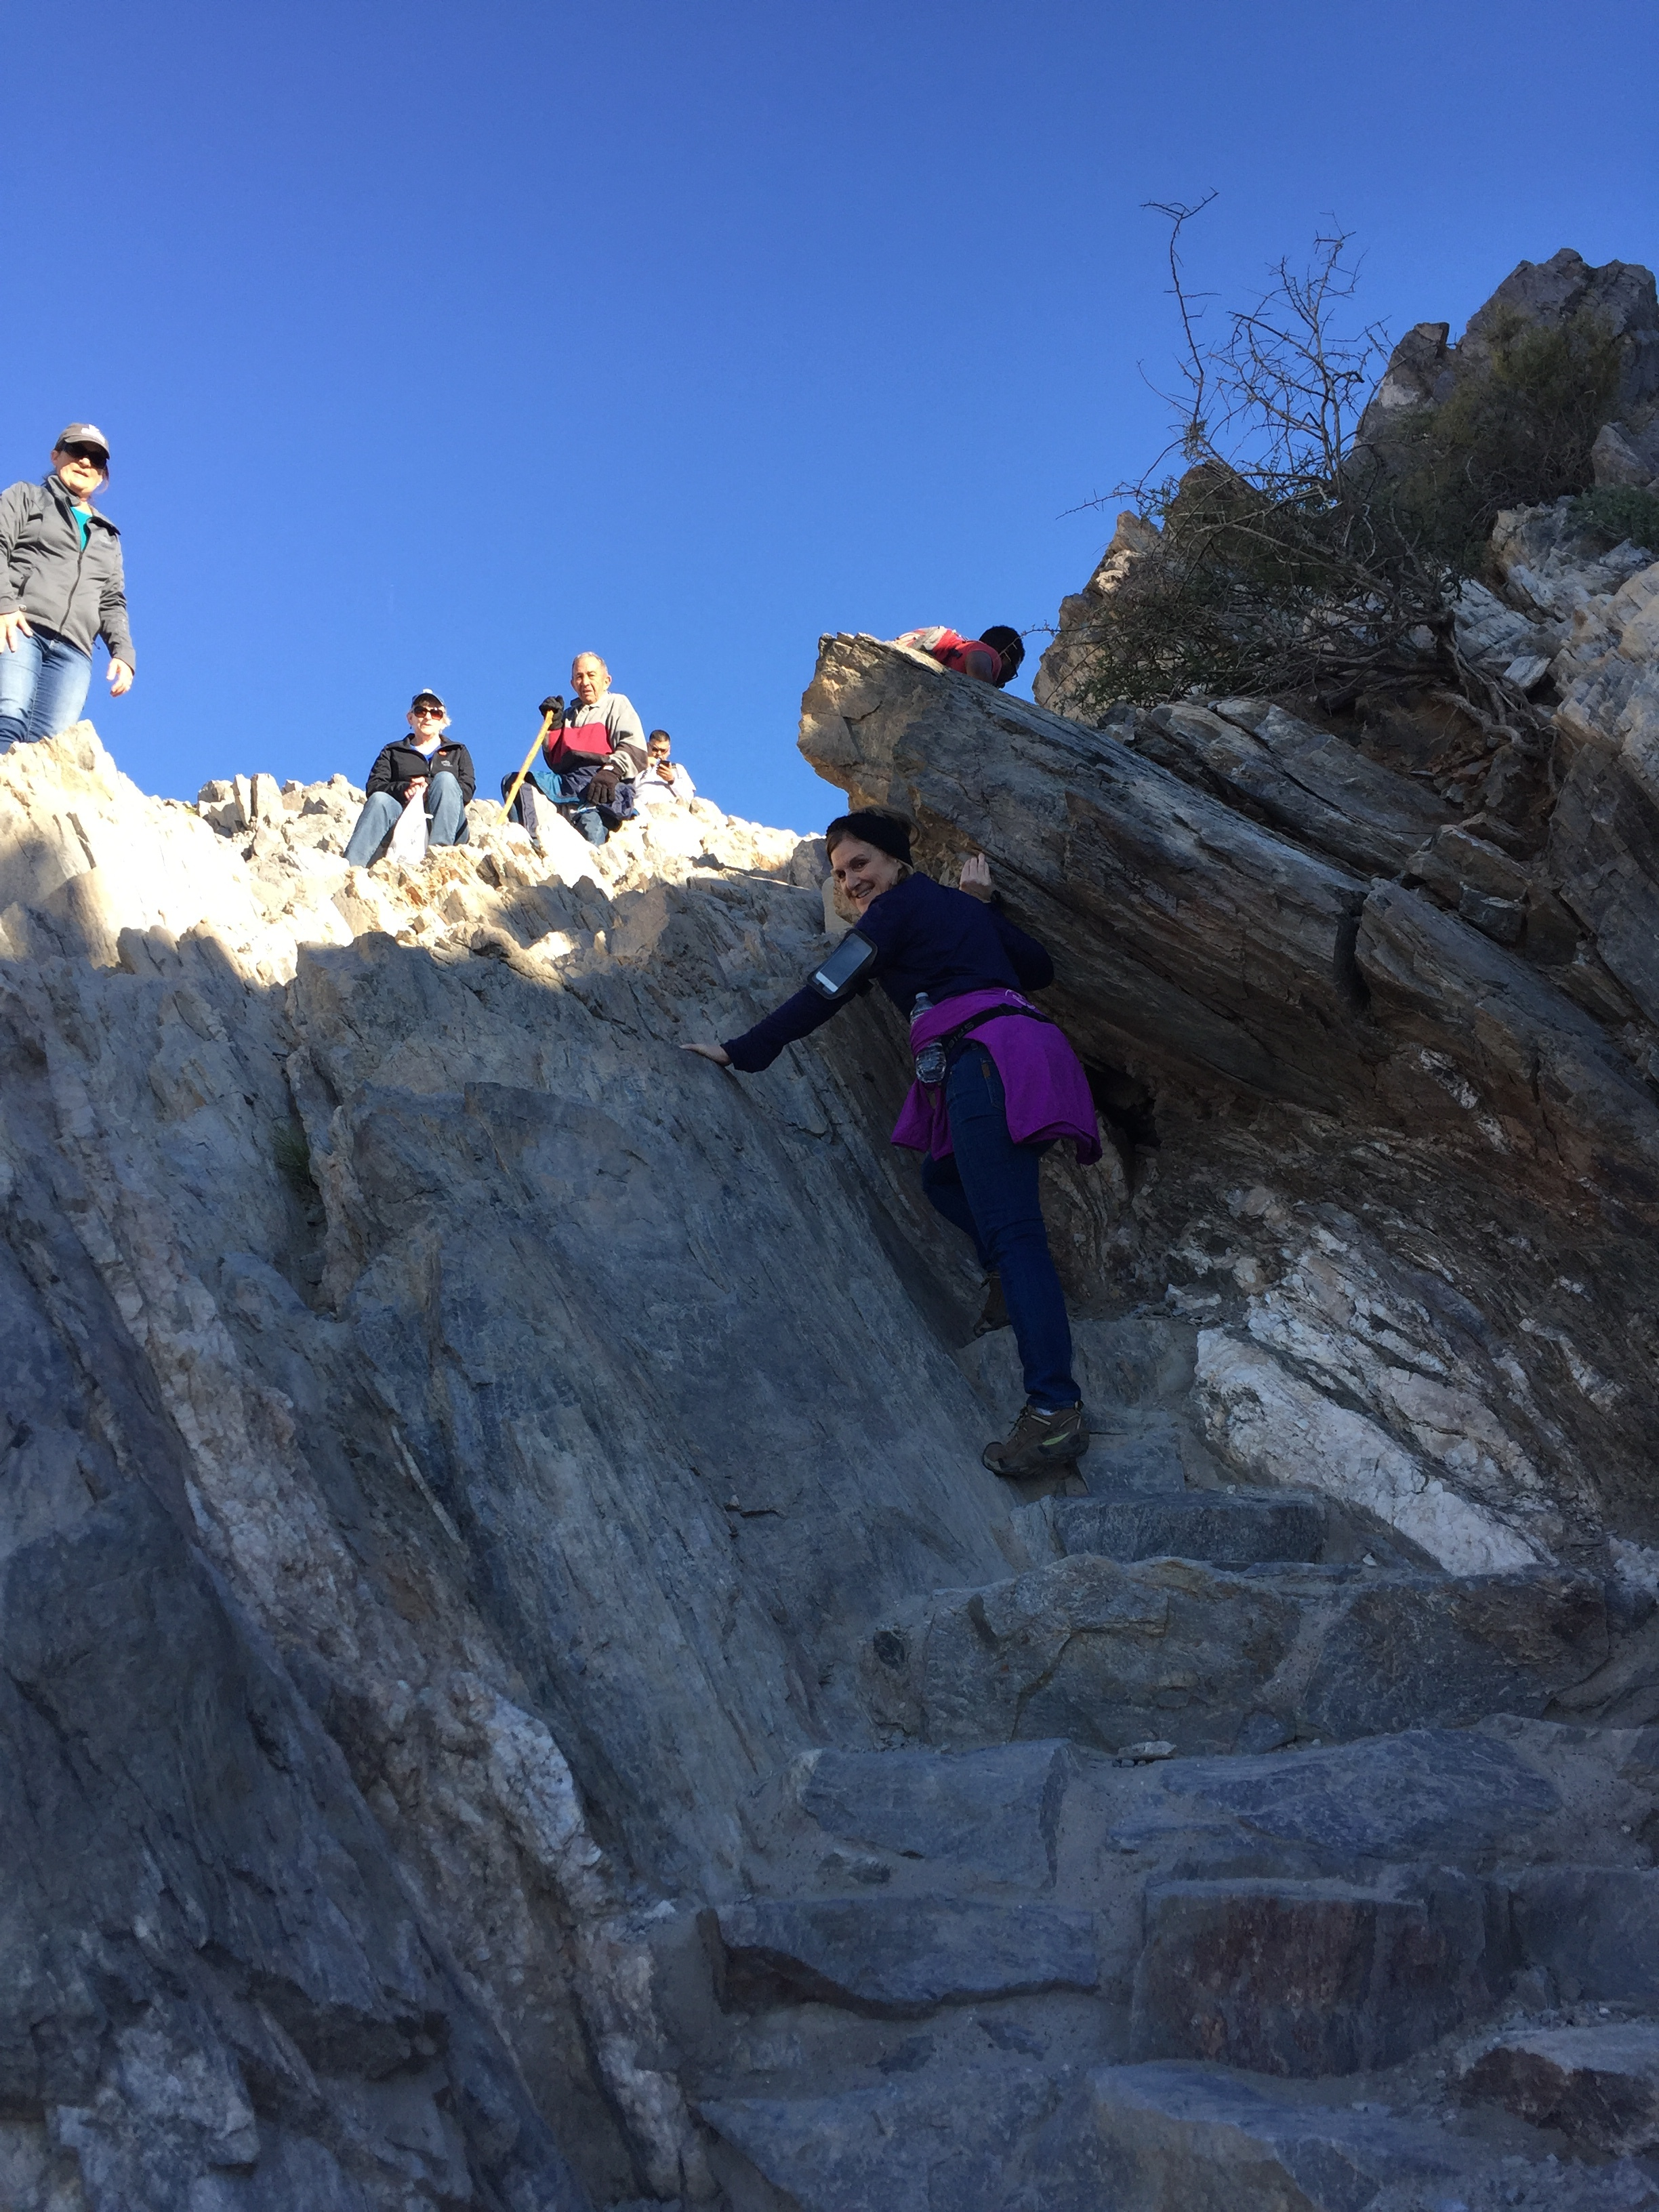 Cheryl climbing the last leg to the top!